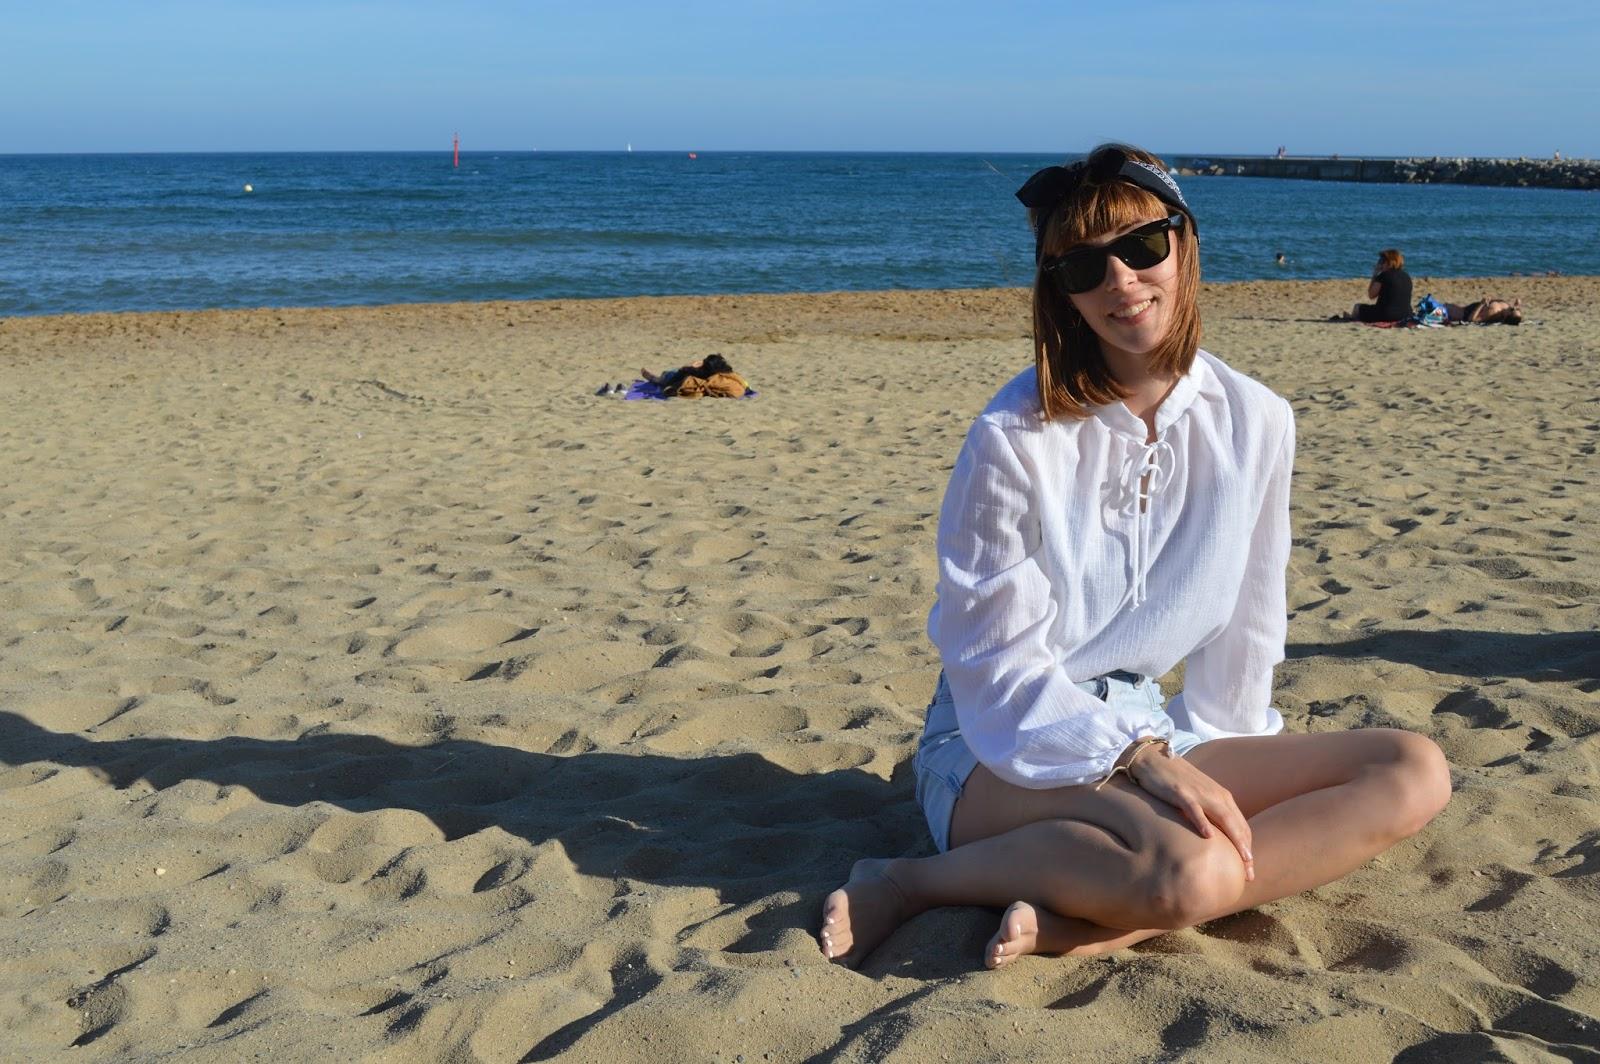 Life update me on Barcelona beach